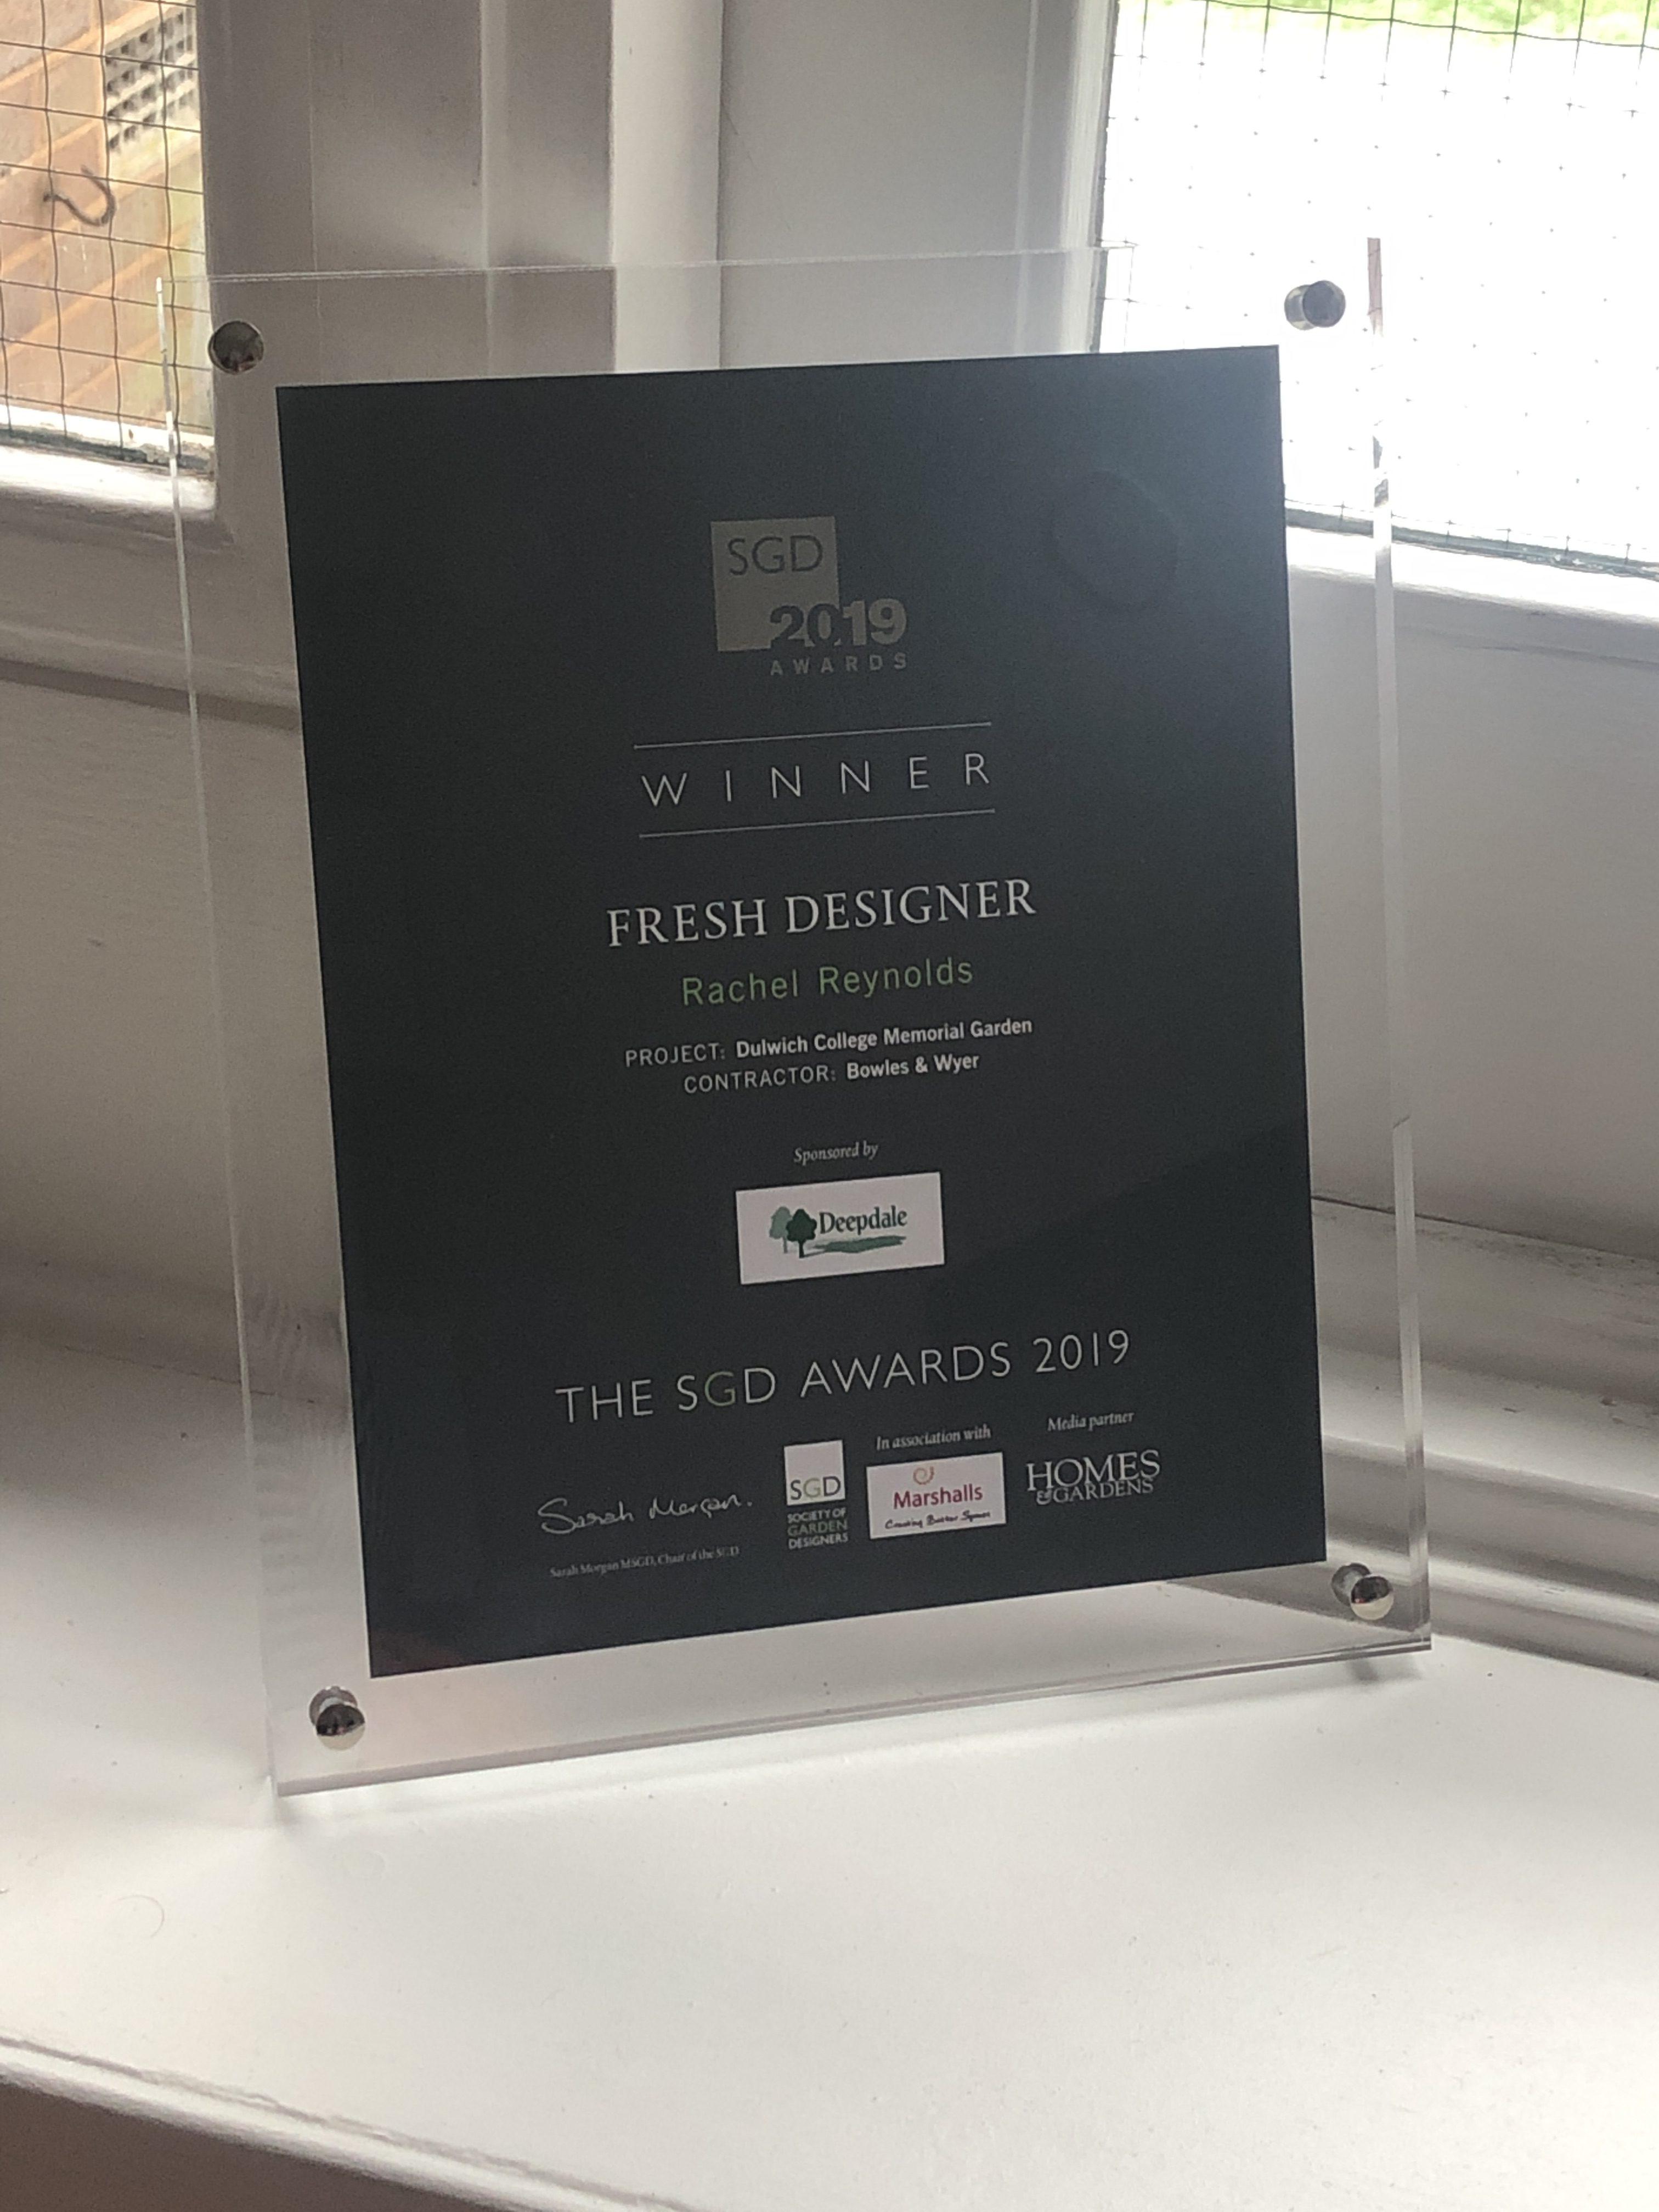 SGD Fresh Designer of the Year 2019